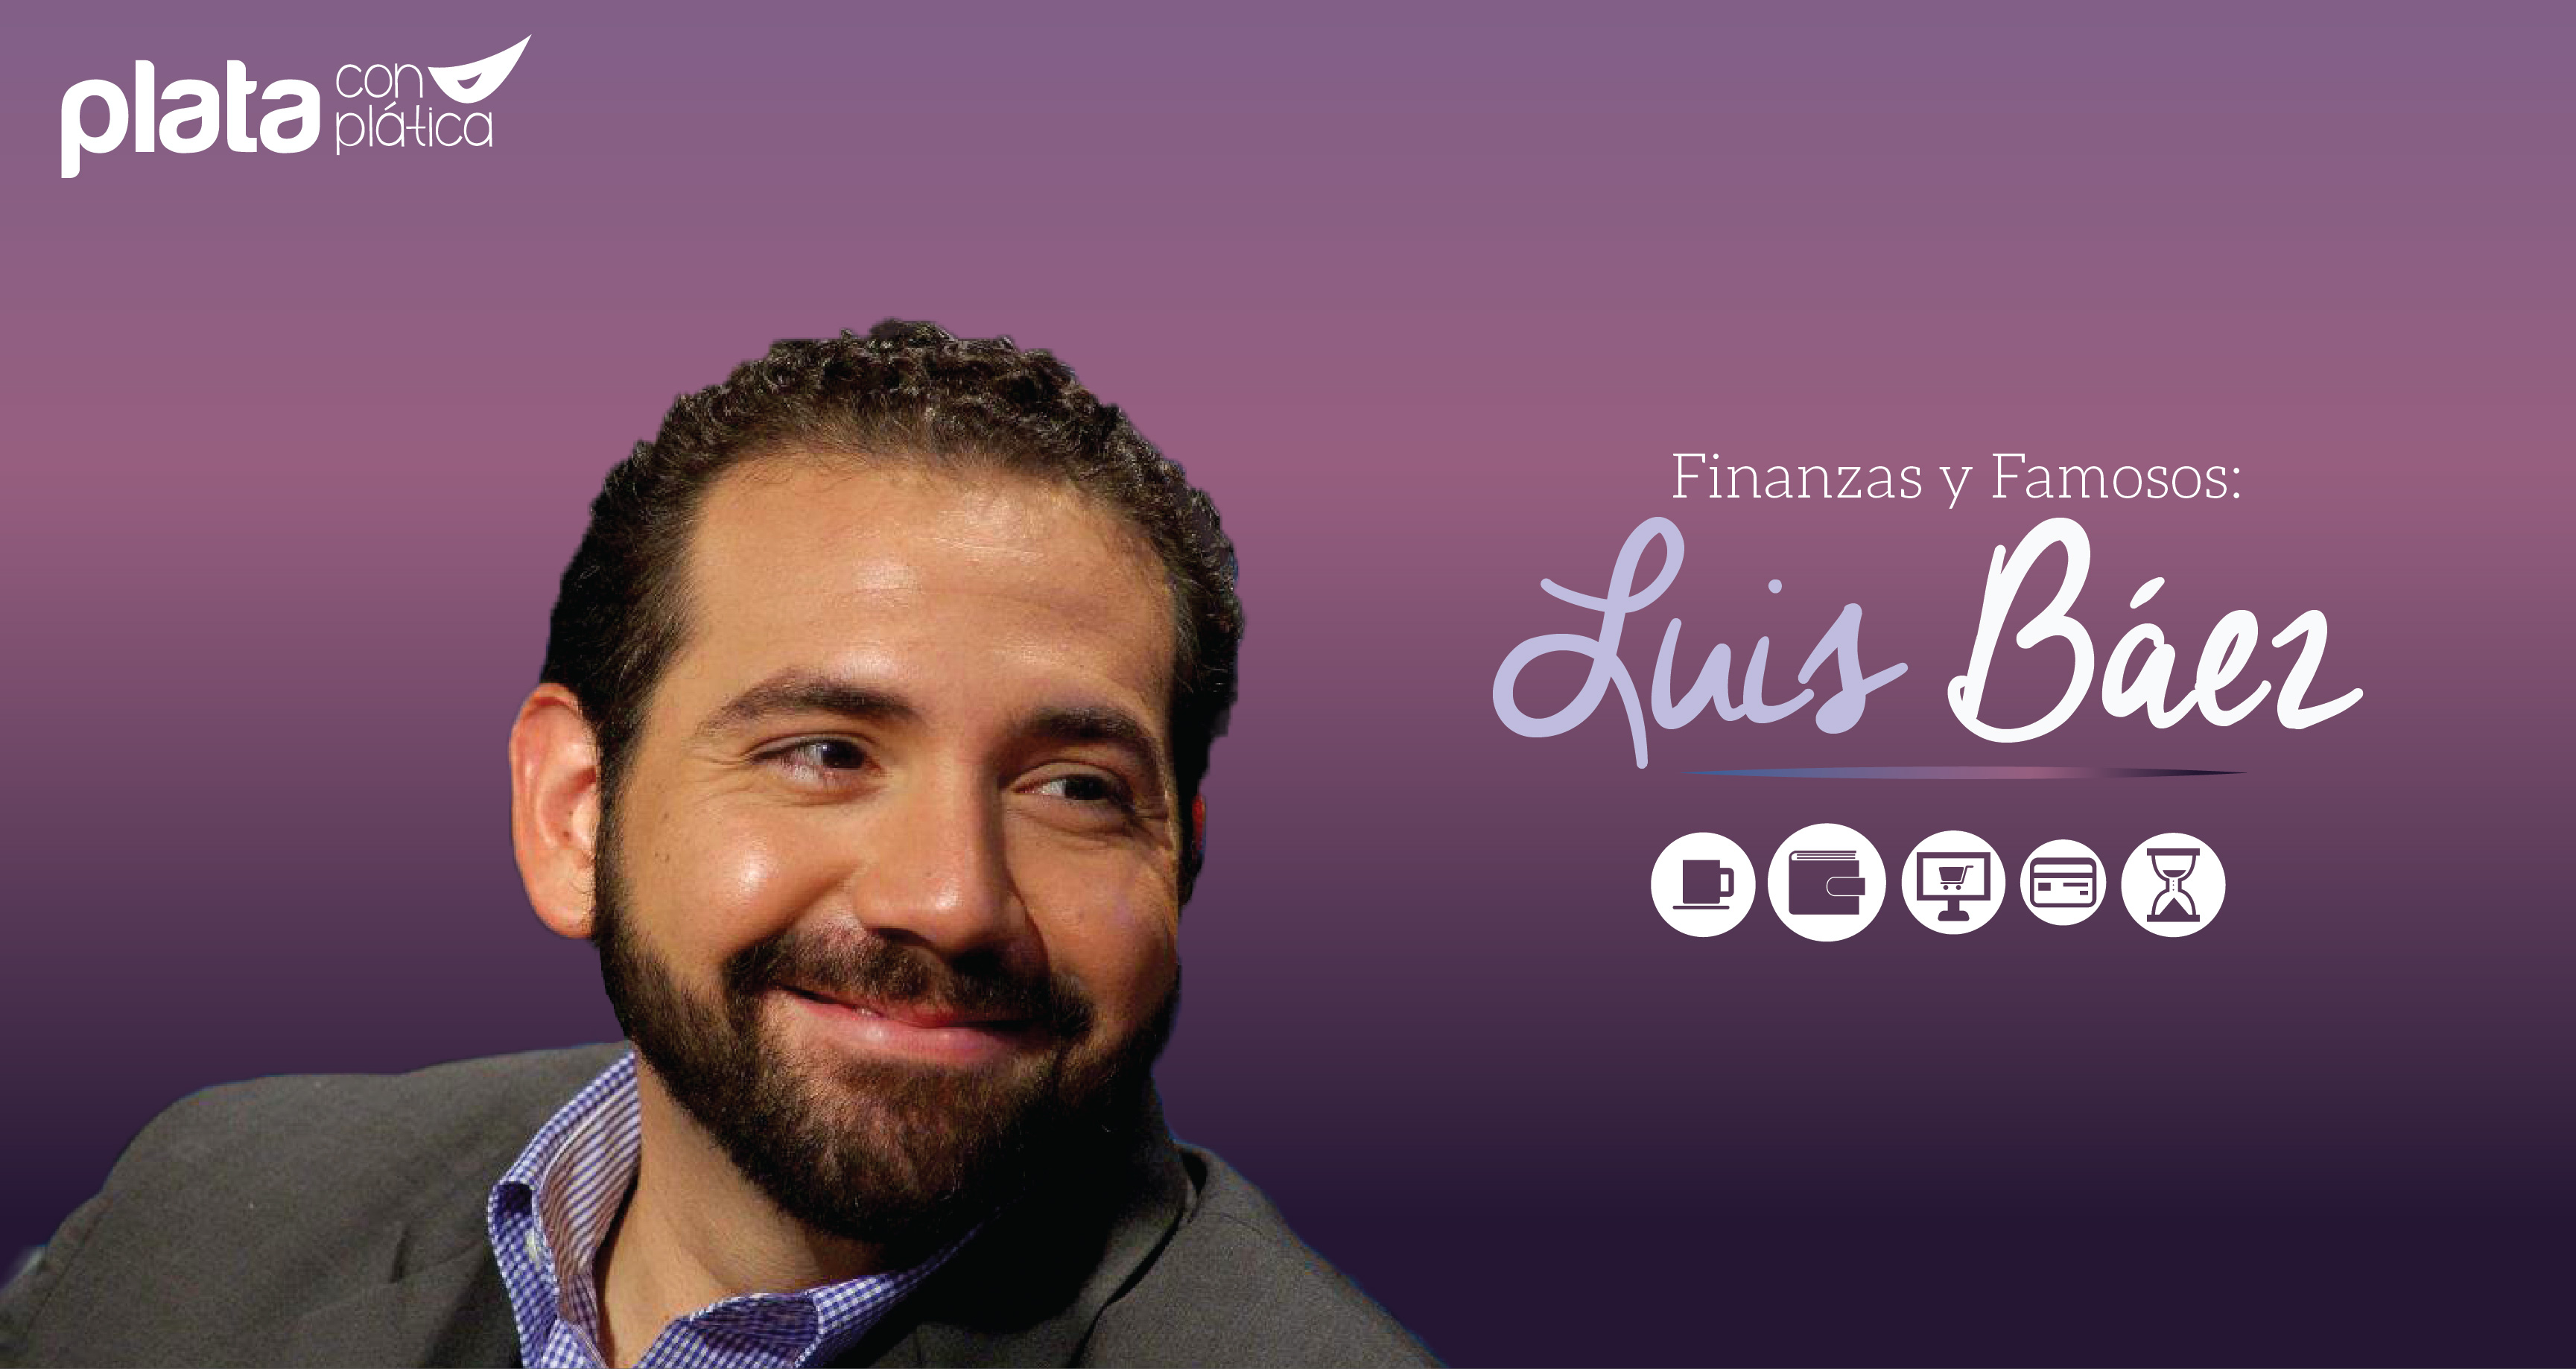 Luis Báez Plata con Plática